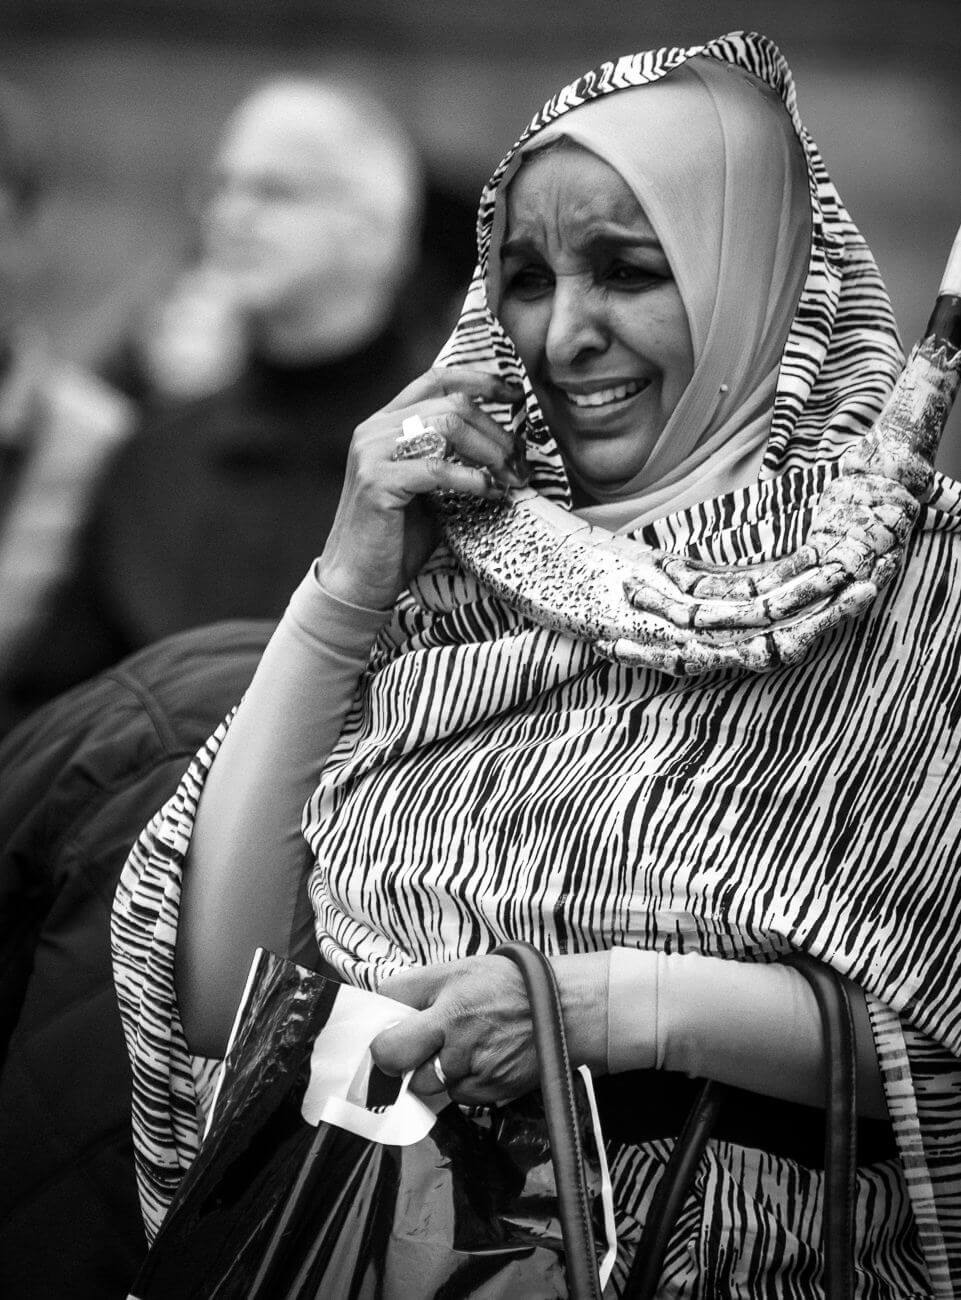 People of Amsterdam   Photograph by Zdenek Sindelar of CuriousZed Photography